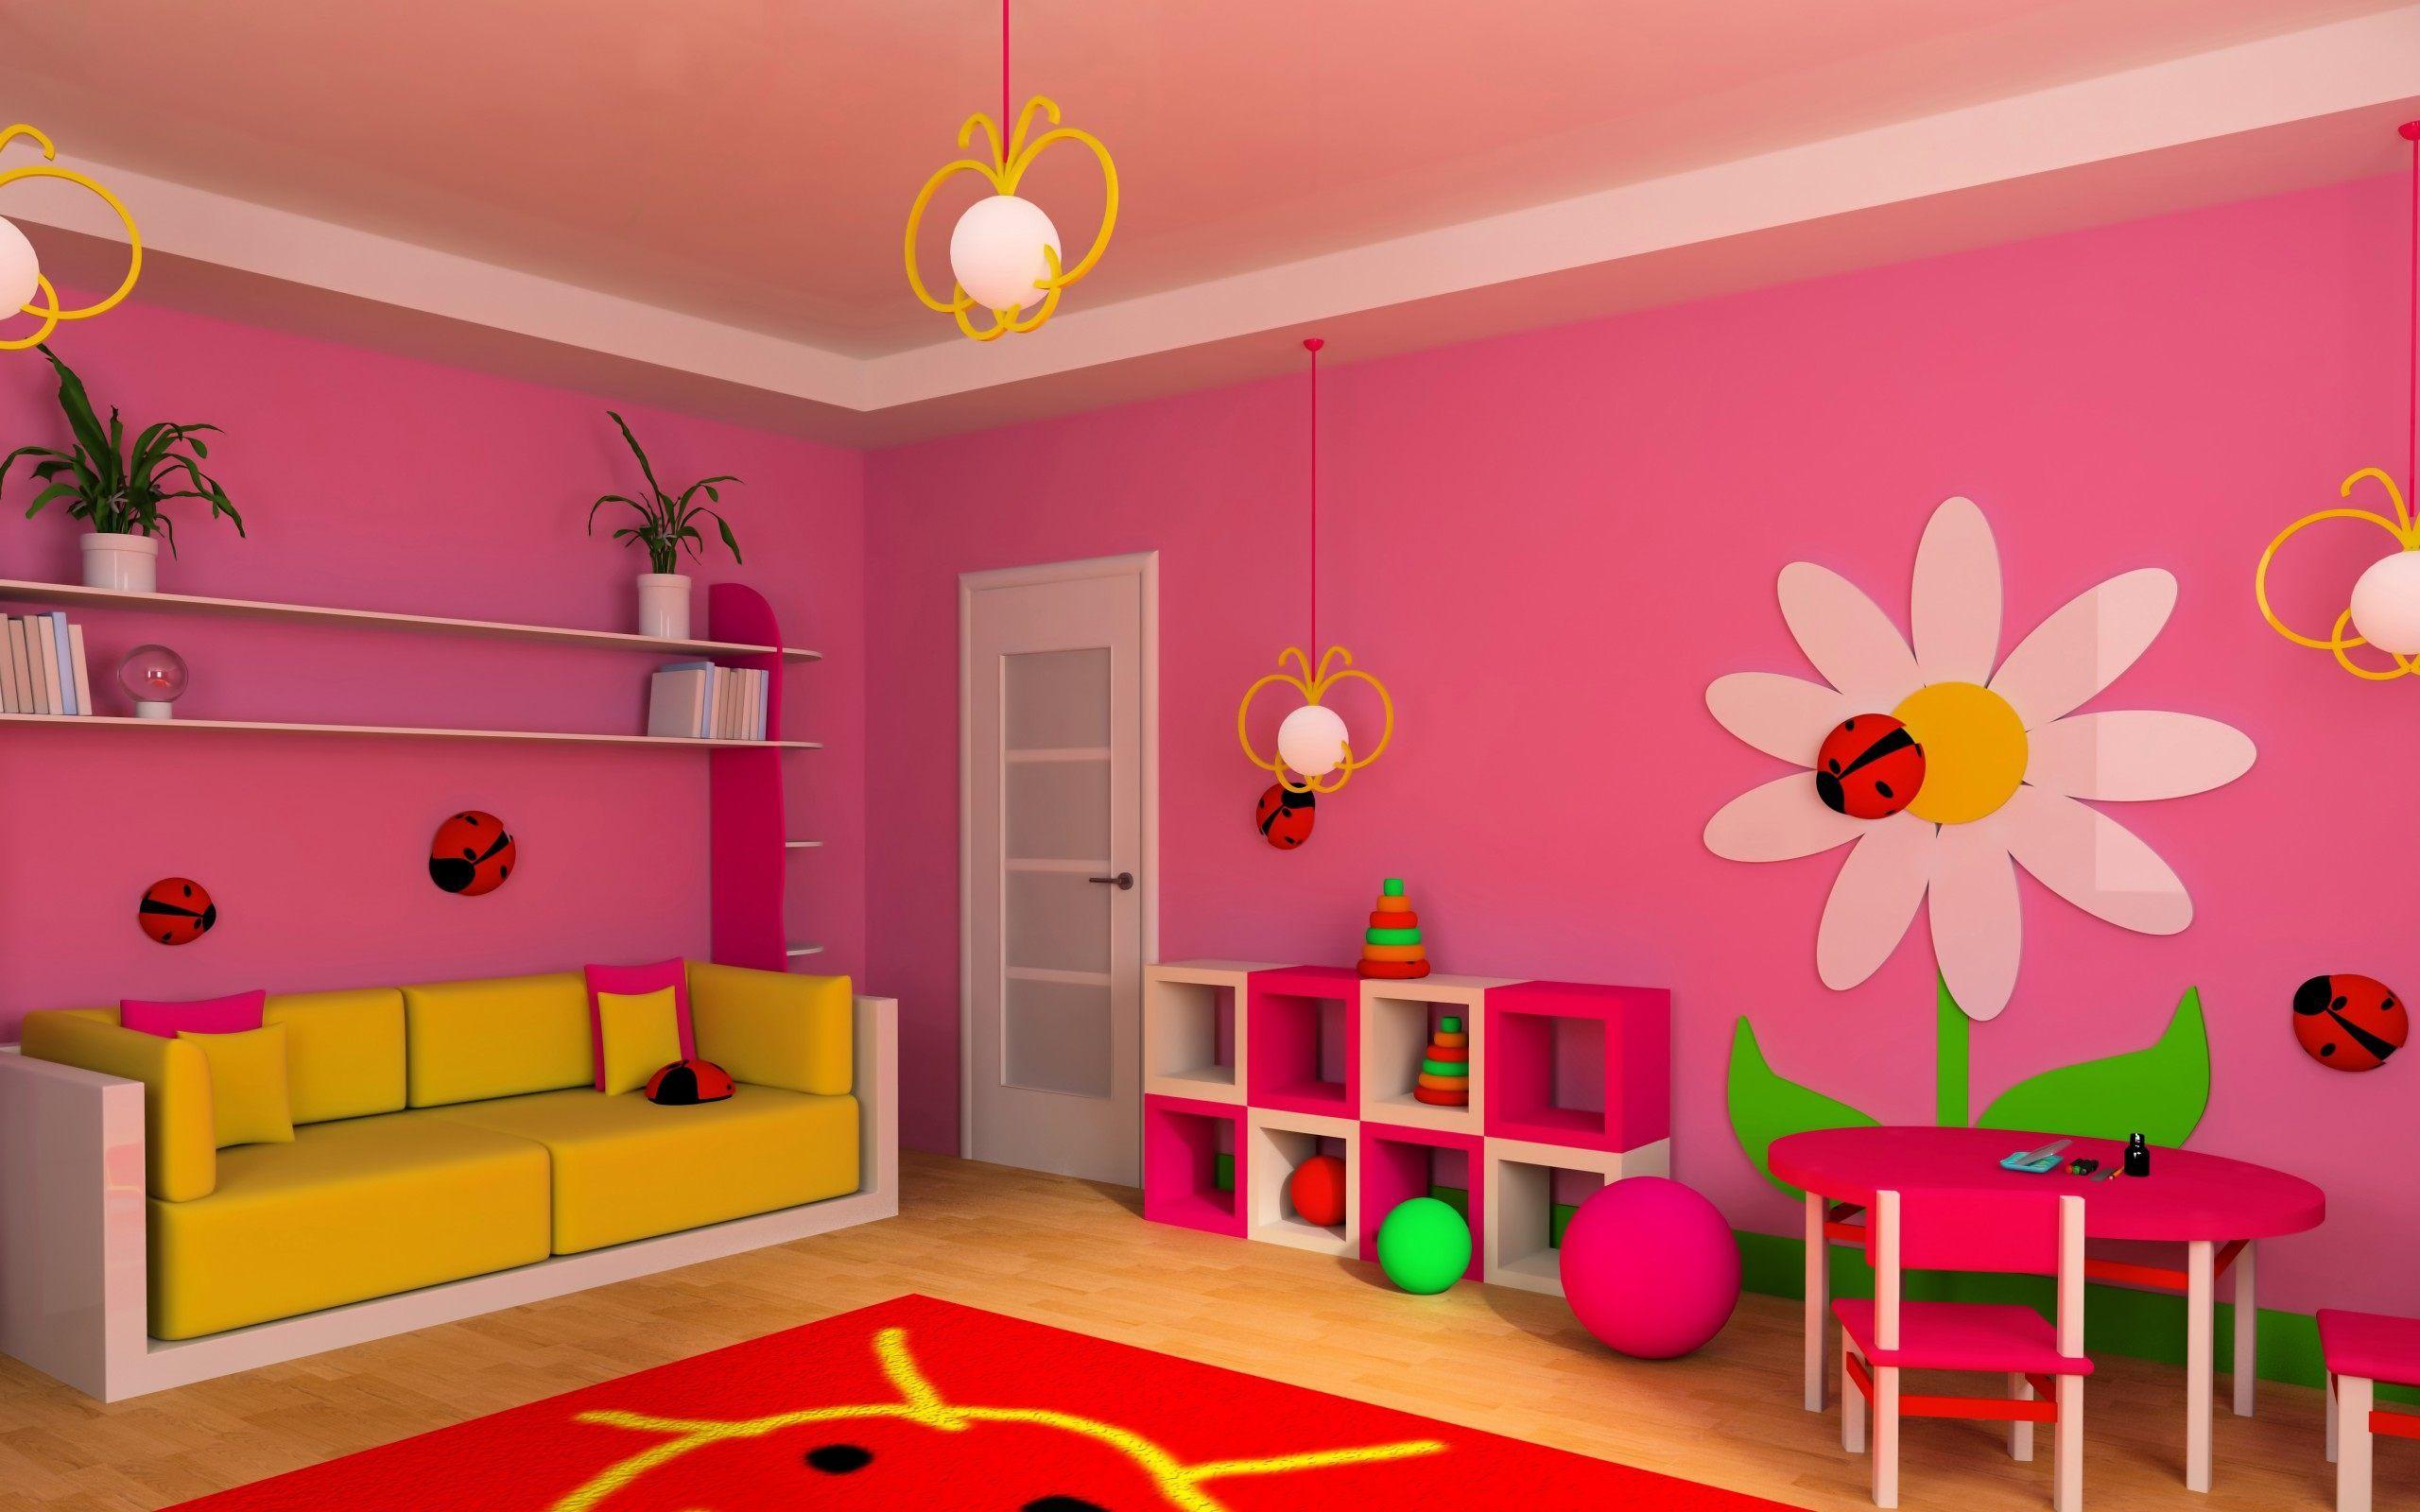 House design hd wallpaper - House Design Hd Wallpaper 43